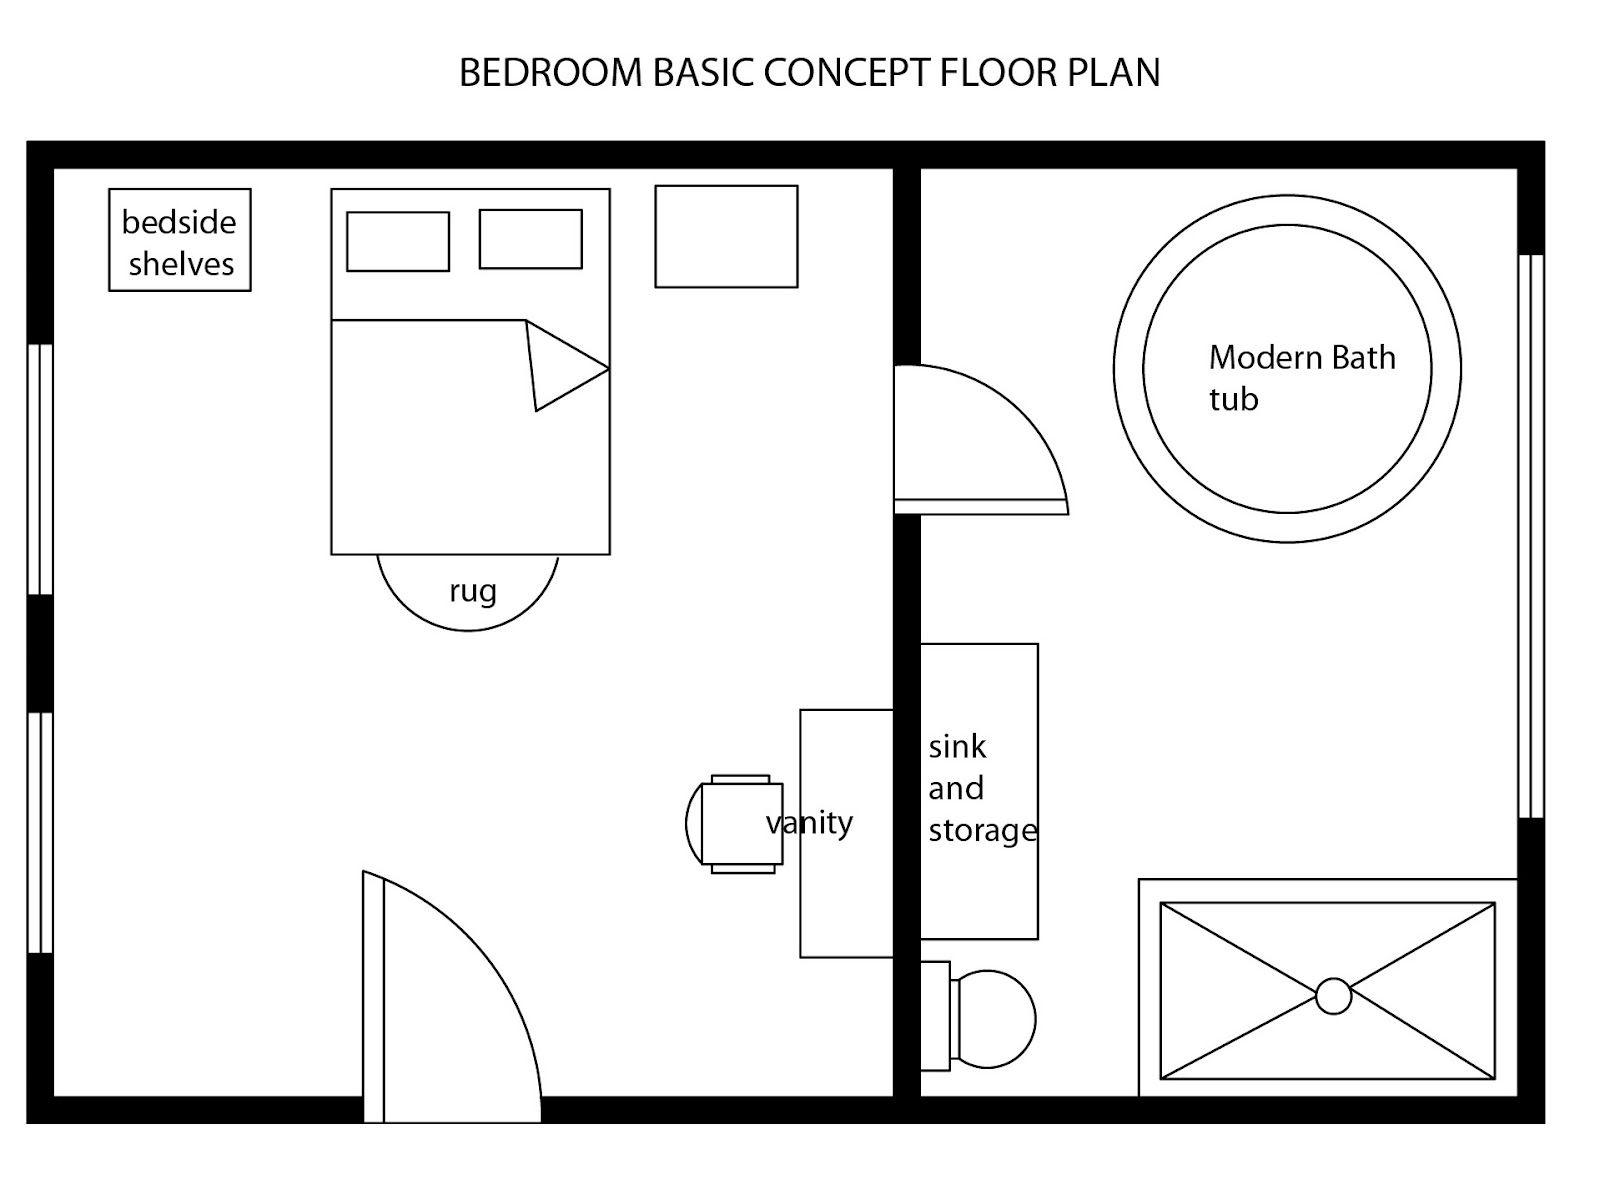 simple 1 bedroom floor plans | design ideas 2017-2018 | pinterest